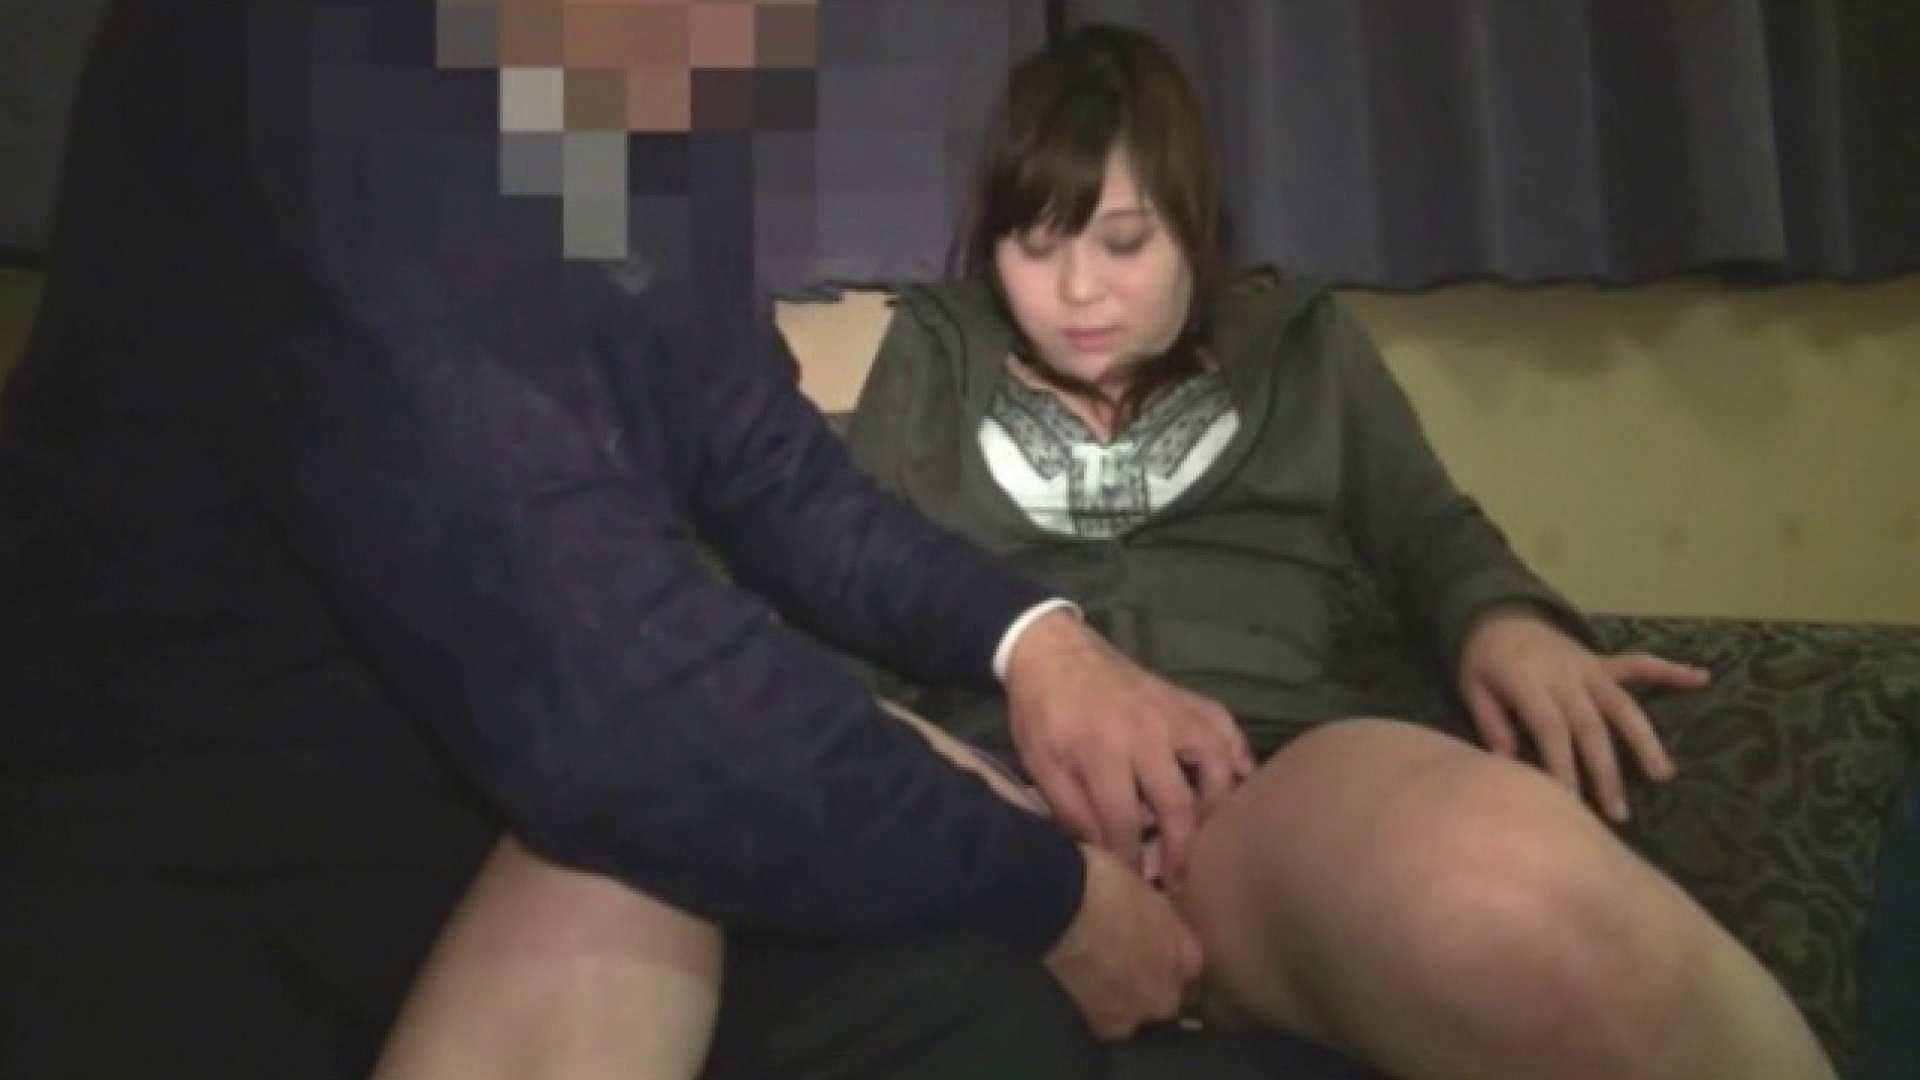 ハメ撮り天国 Vol.6 前編 流出作品  85枚 6